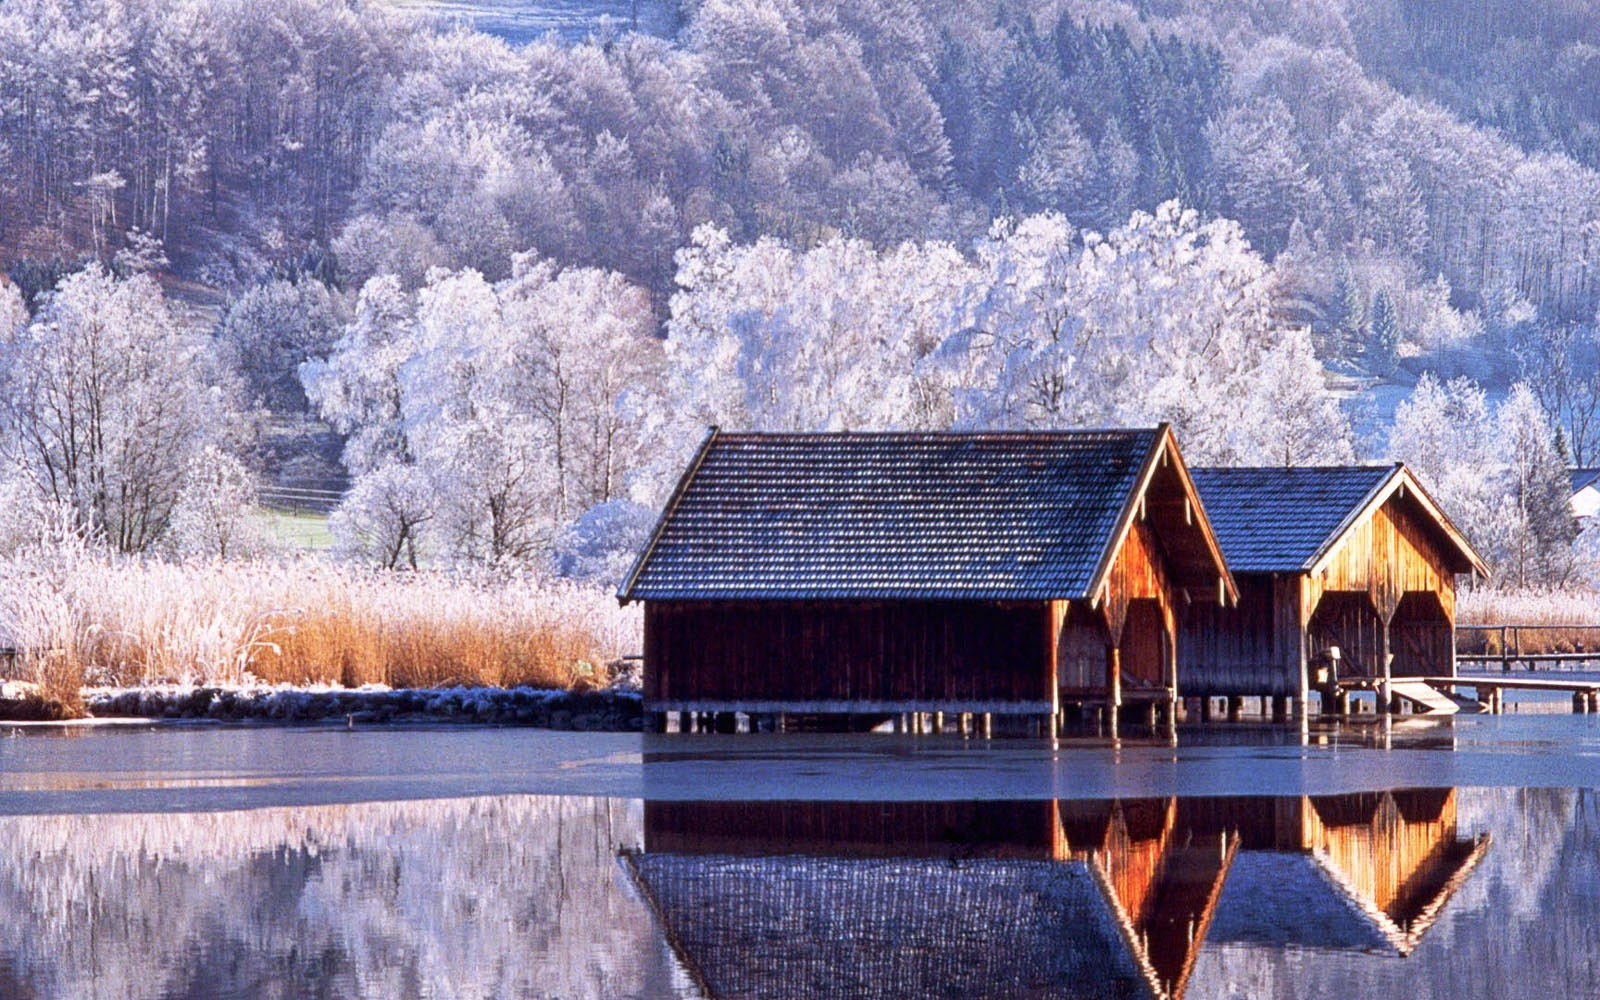 Wallpapers: Beautiful Winter Scenery Wallpapers